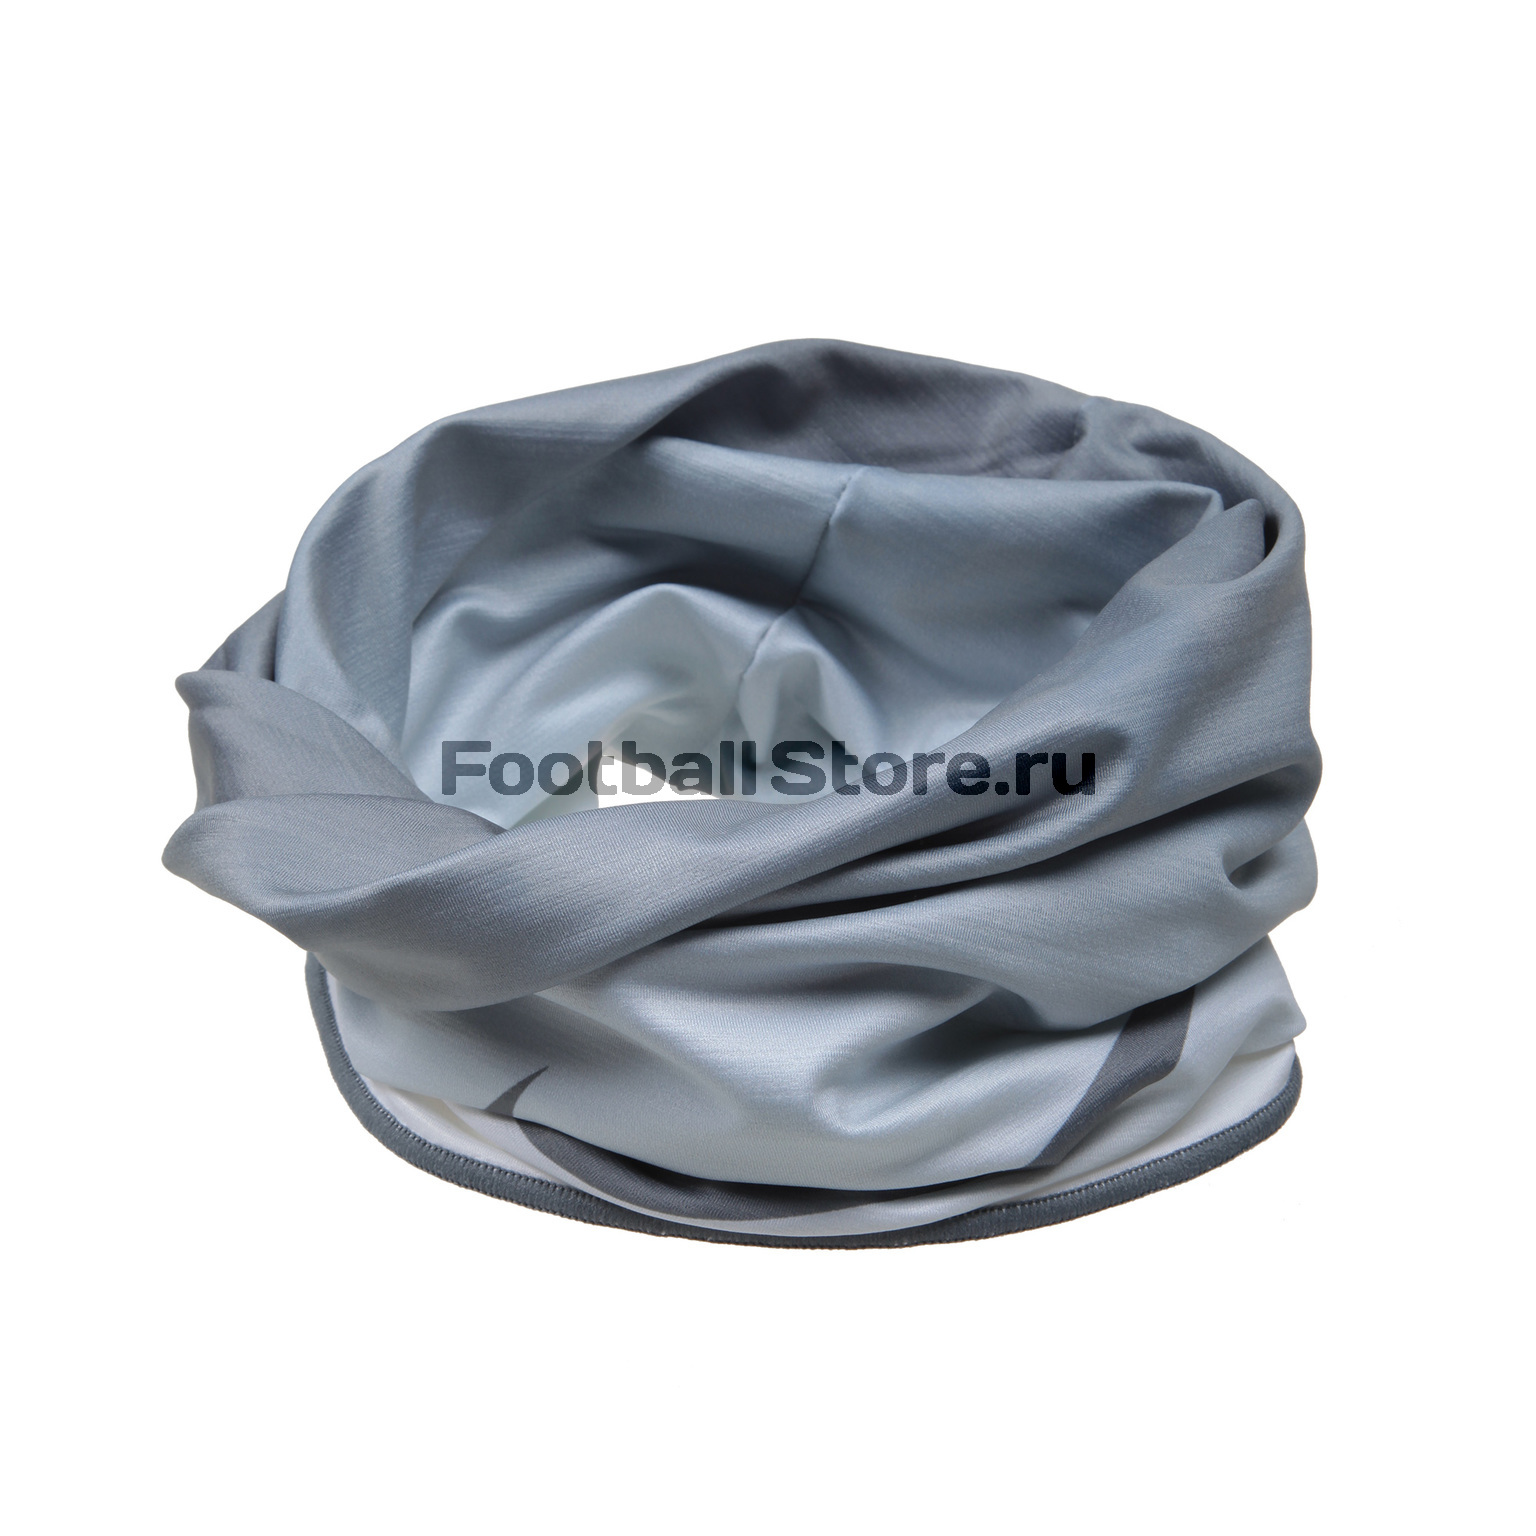 Повязка на шею (Гейтор) Nike Convertible N.WA.67.047.OS повязка на голову nike swoosh headband n nn 07 101 os